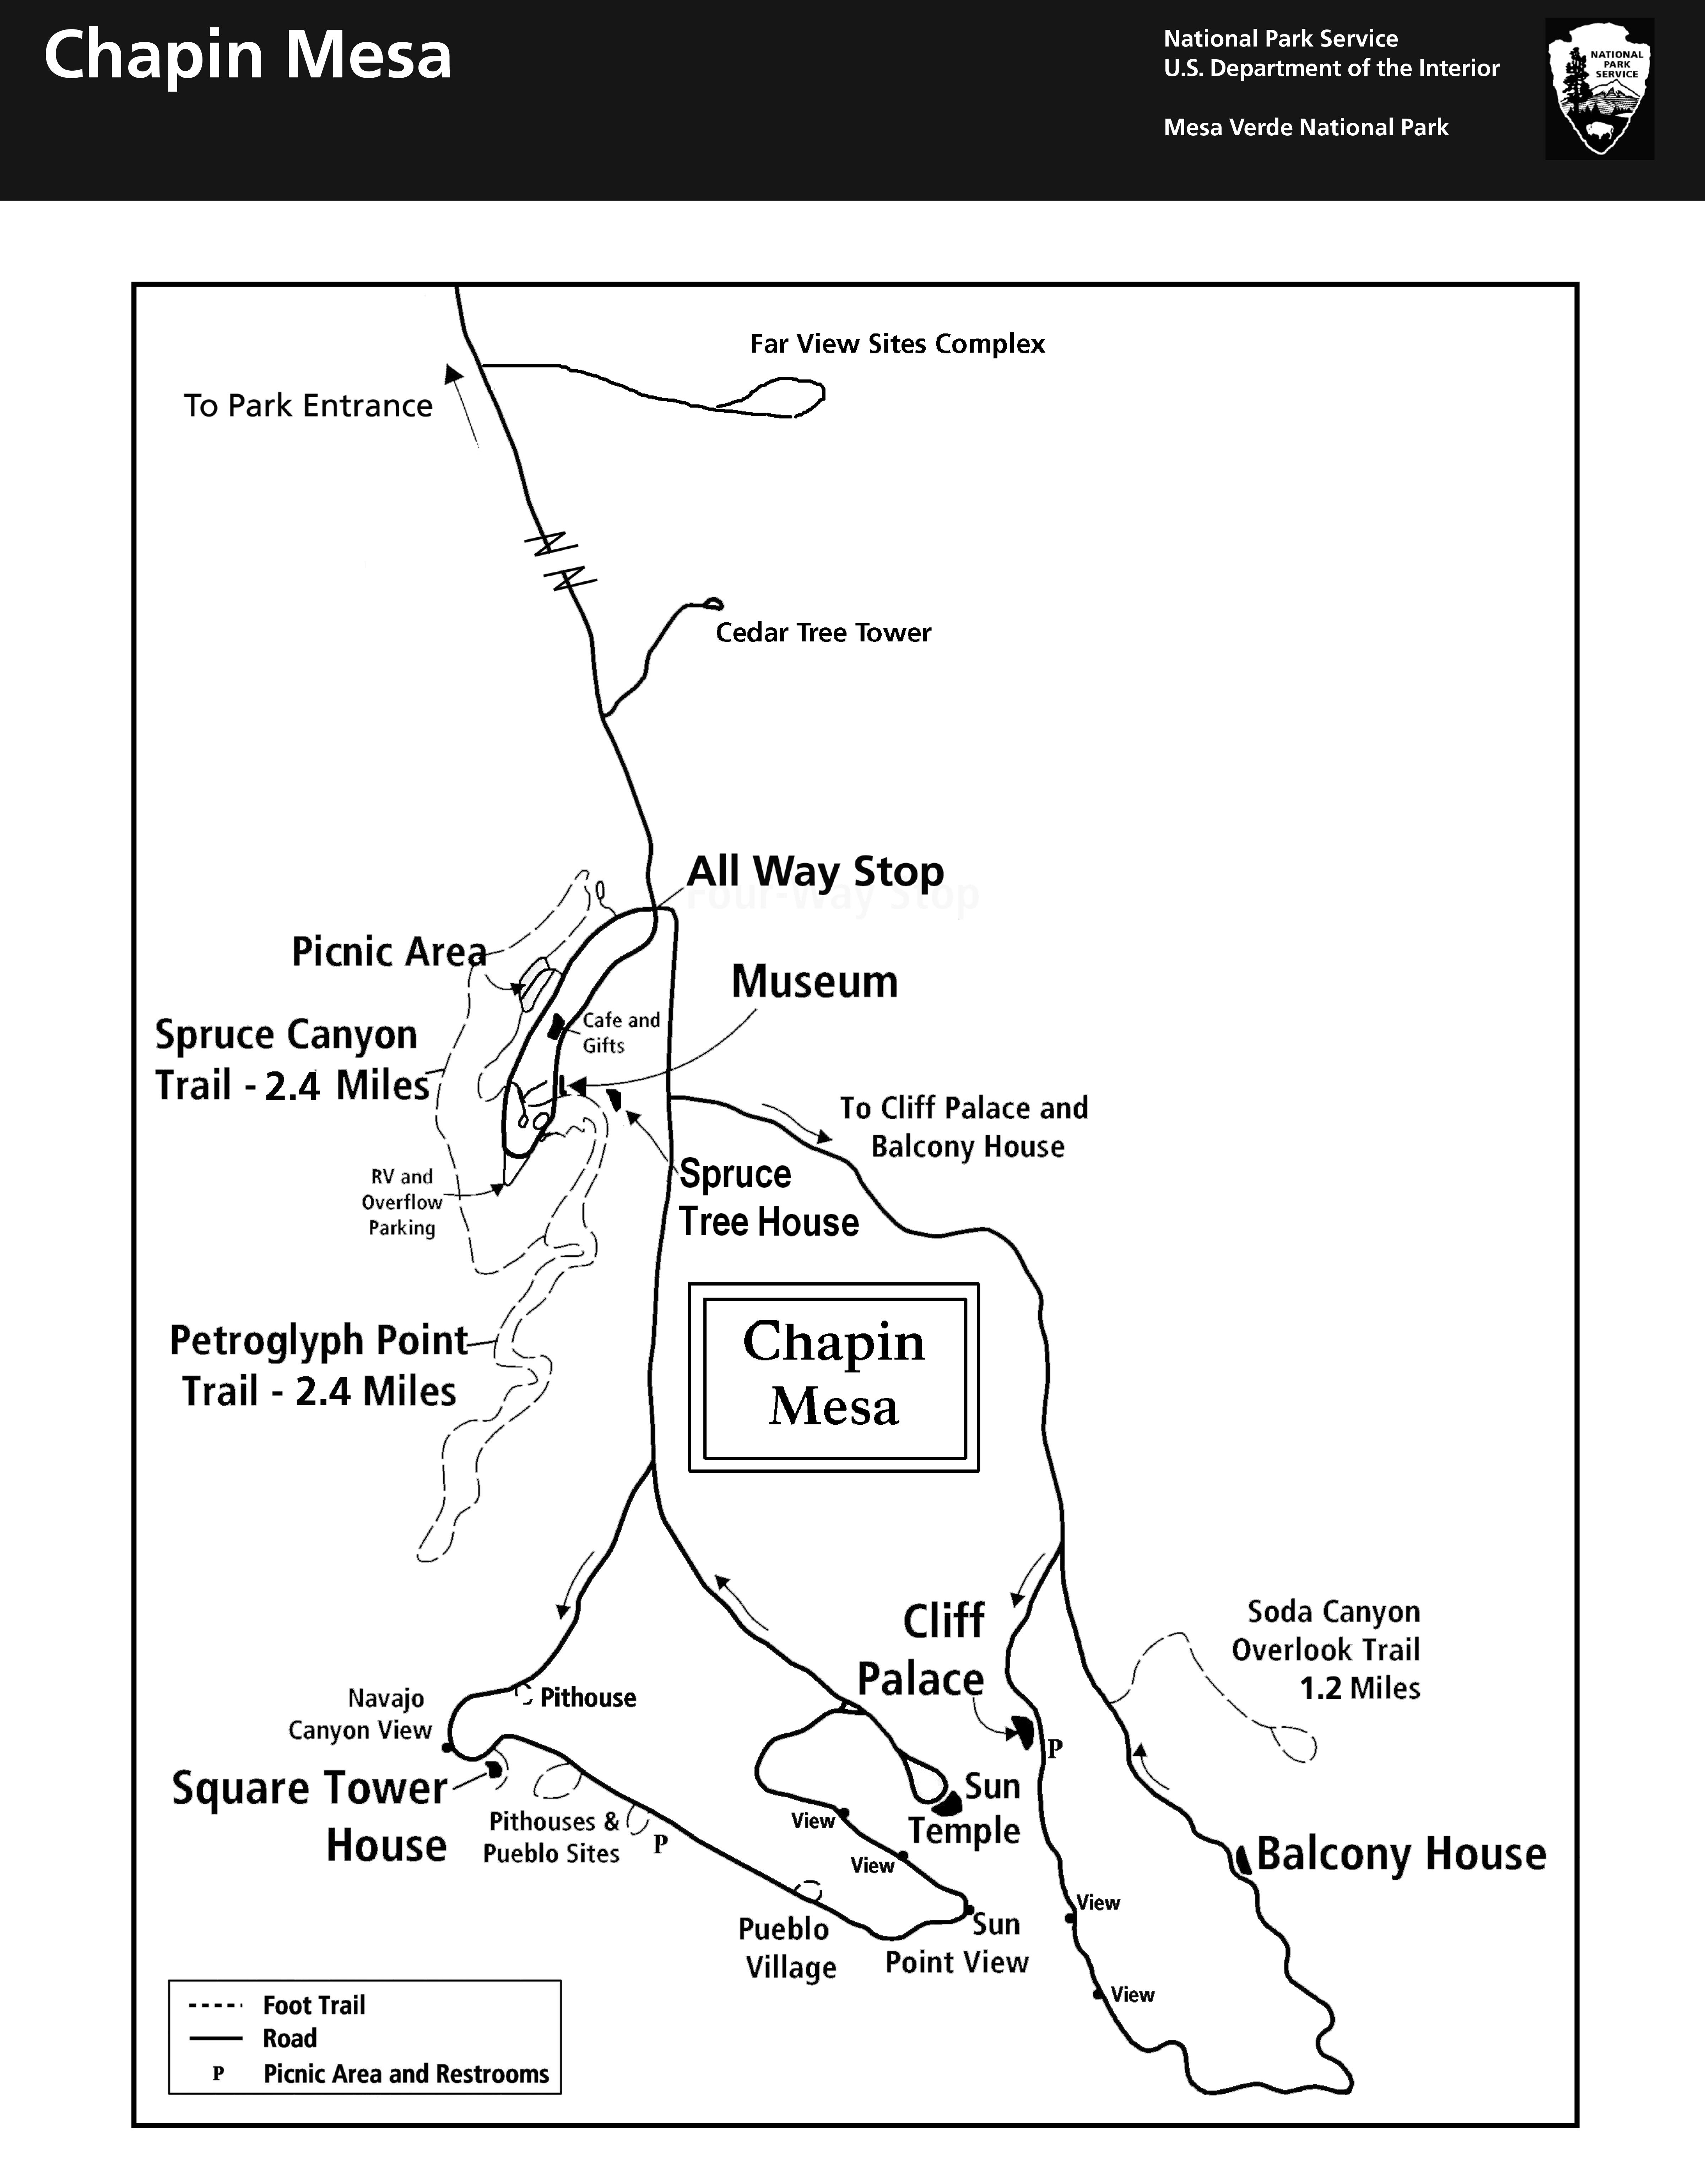 Maps - Mesa Verde National Park (U.S. National Park Service)